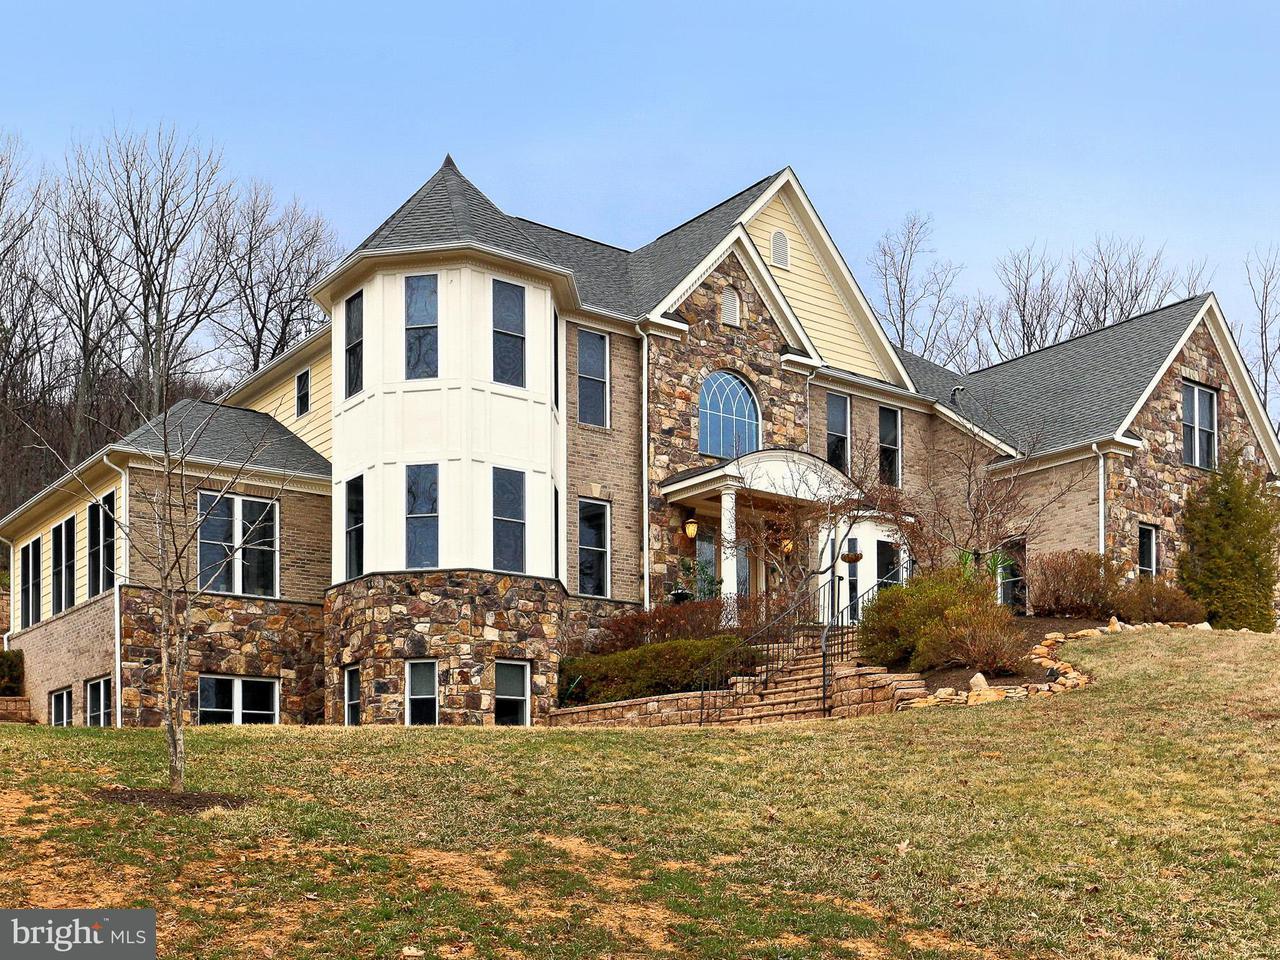 独户住宅 为 销售 在 3718 Mountain Road 3718 Mountain Road Haymarket, 弗吉尼亚州 20169 美国